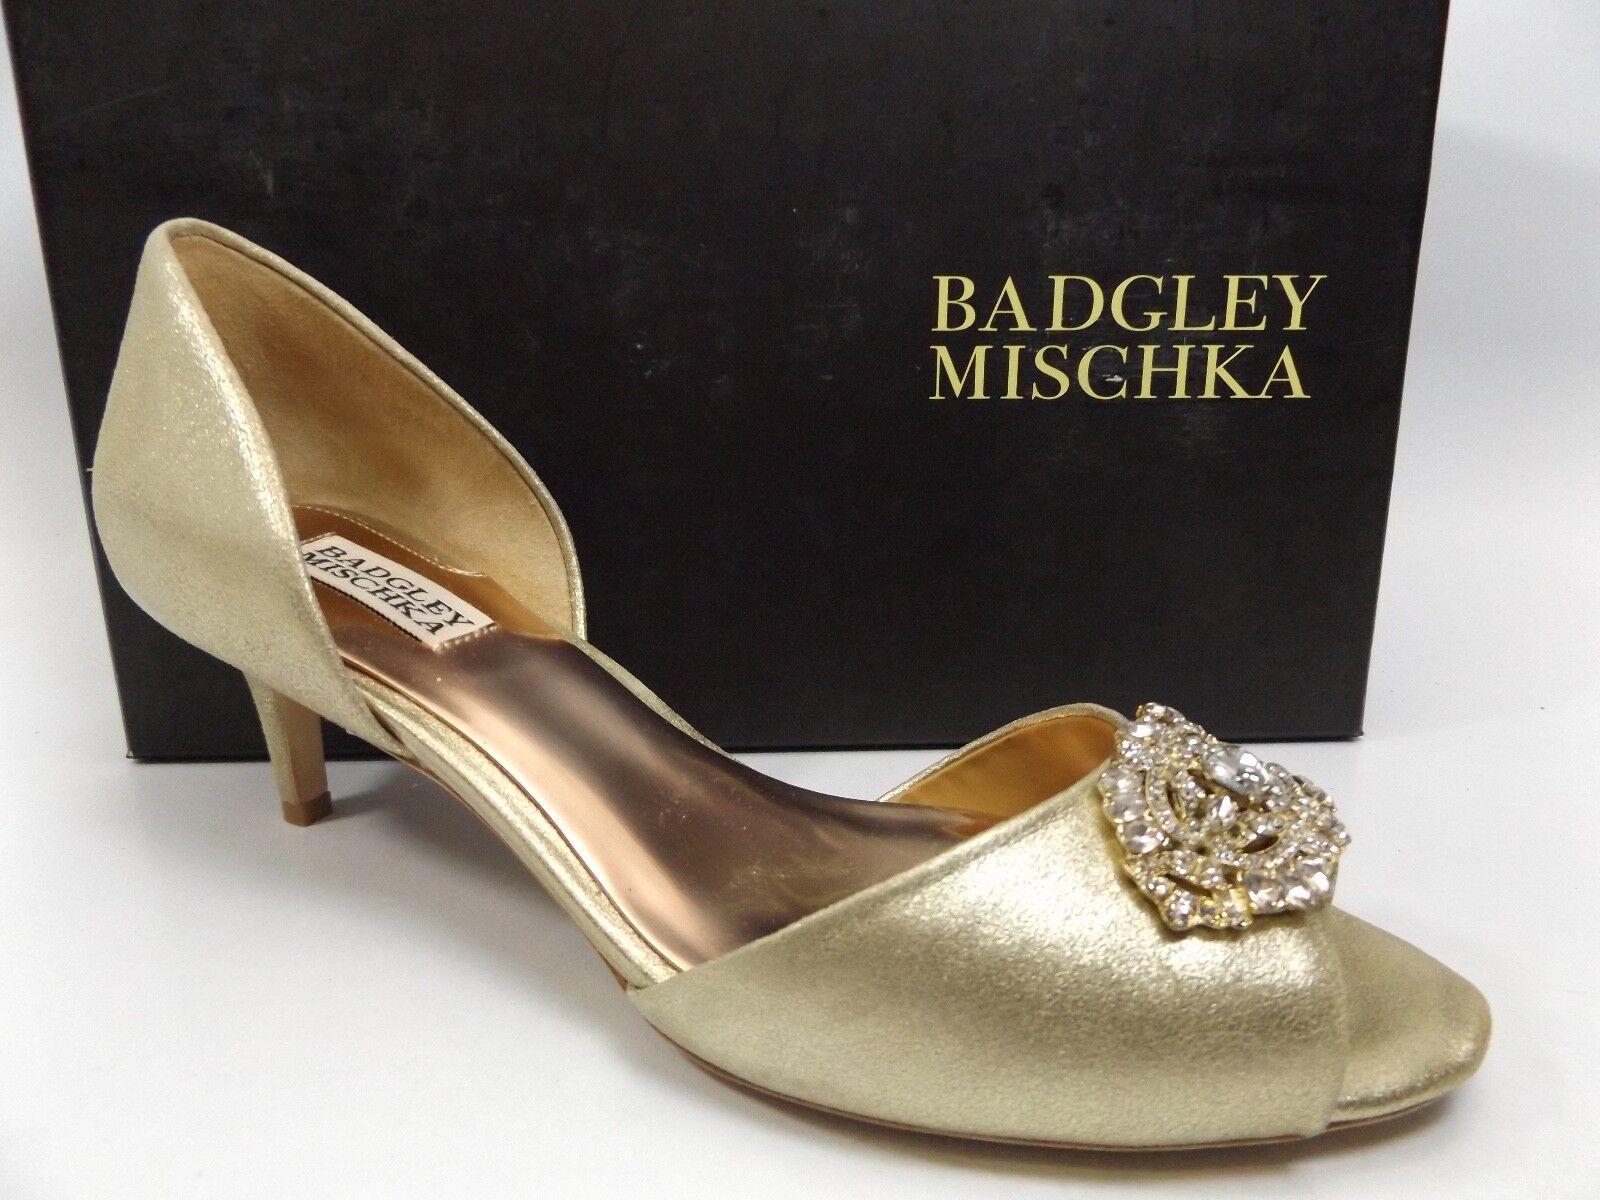 Badgley Mischka Femme Petrina II D'ORSAY Pompe, Platino, SZ 9.0 M Display D7812